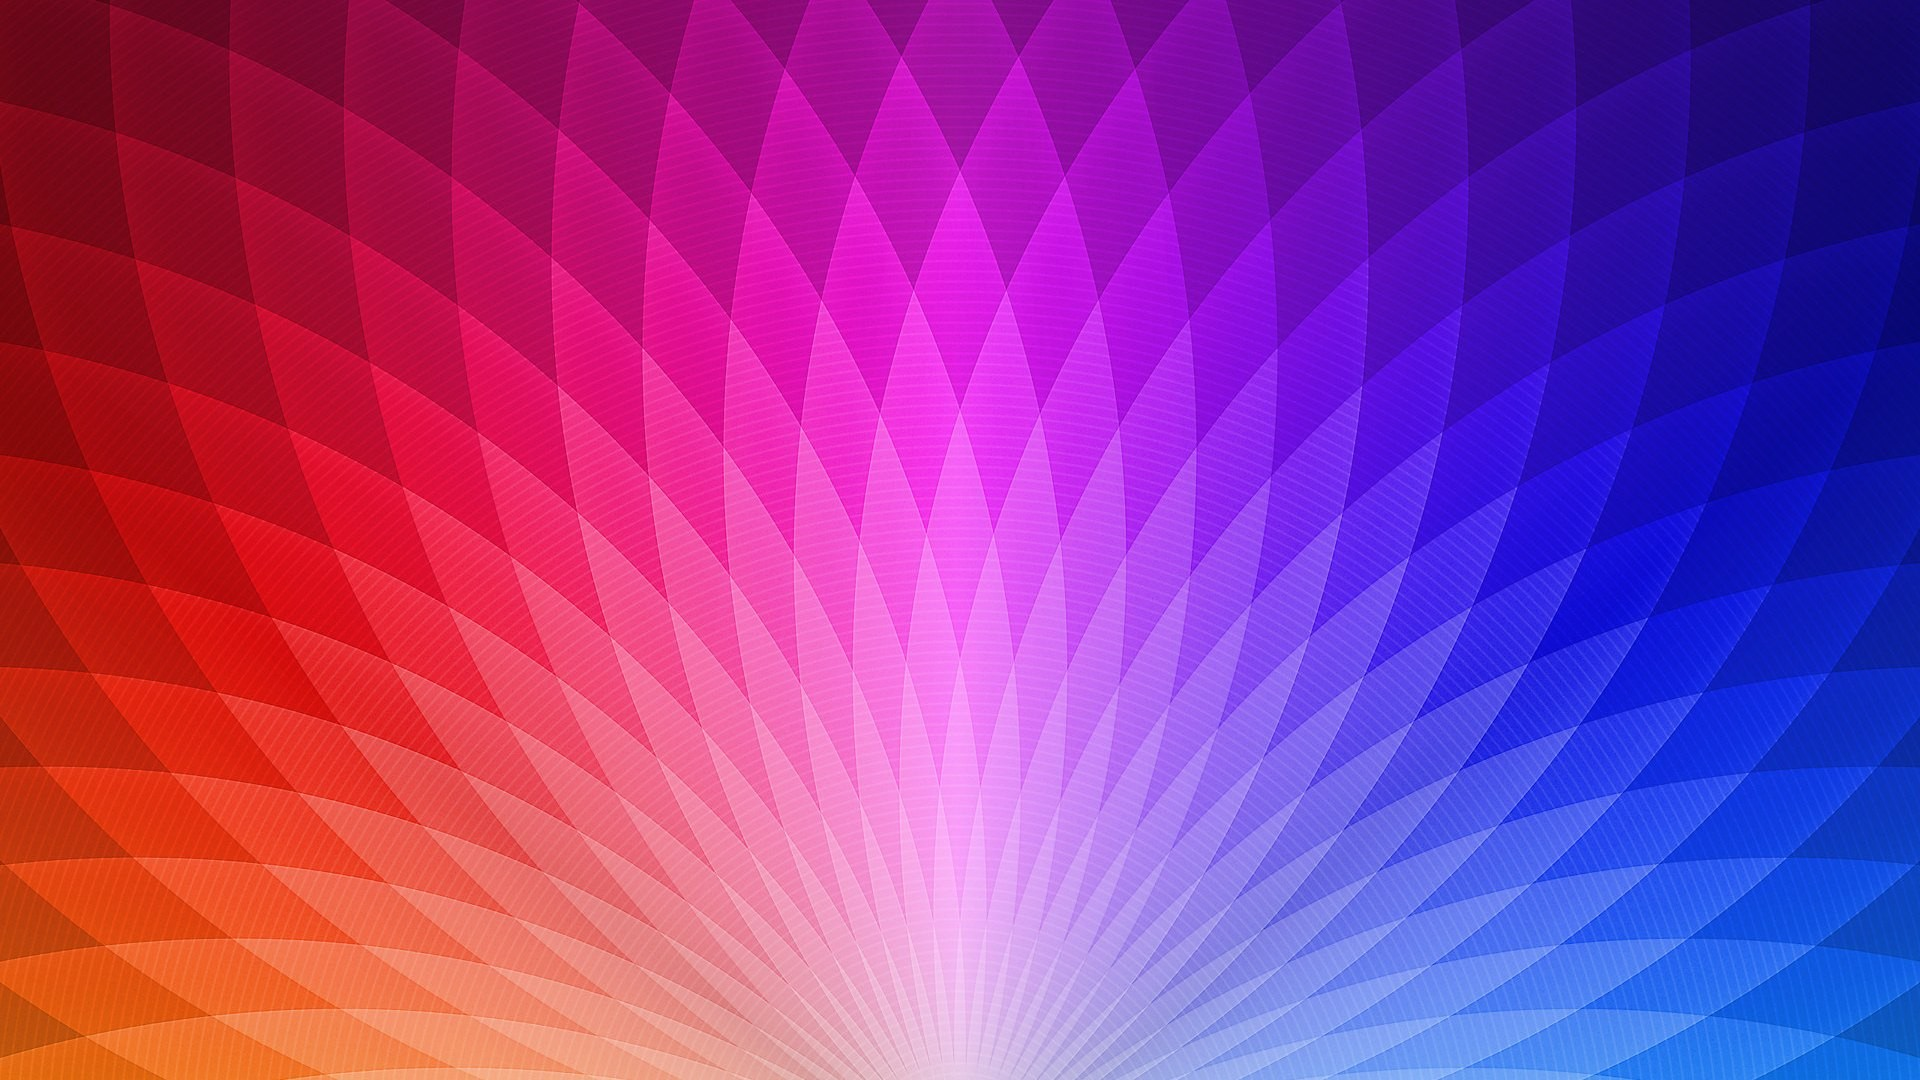 abstract-colors-desktop-hd-wallpaper-14969.jpg (1920×